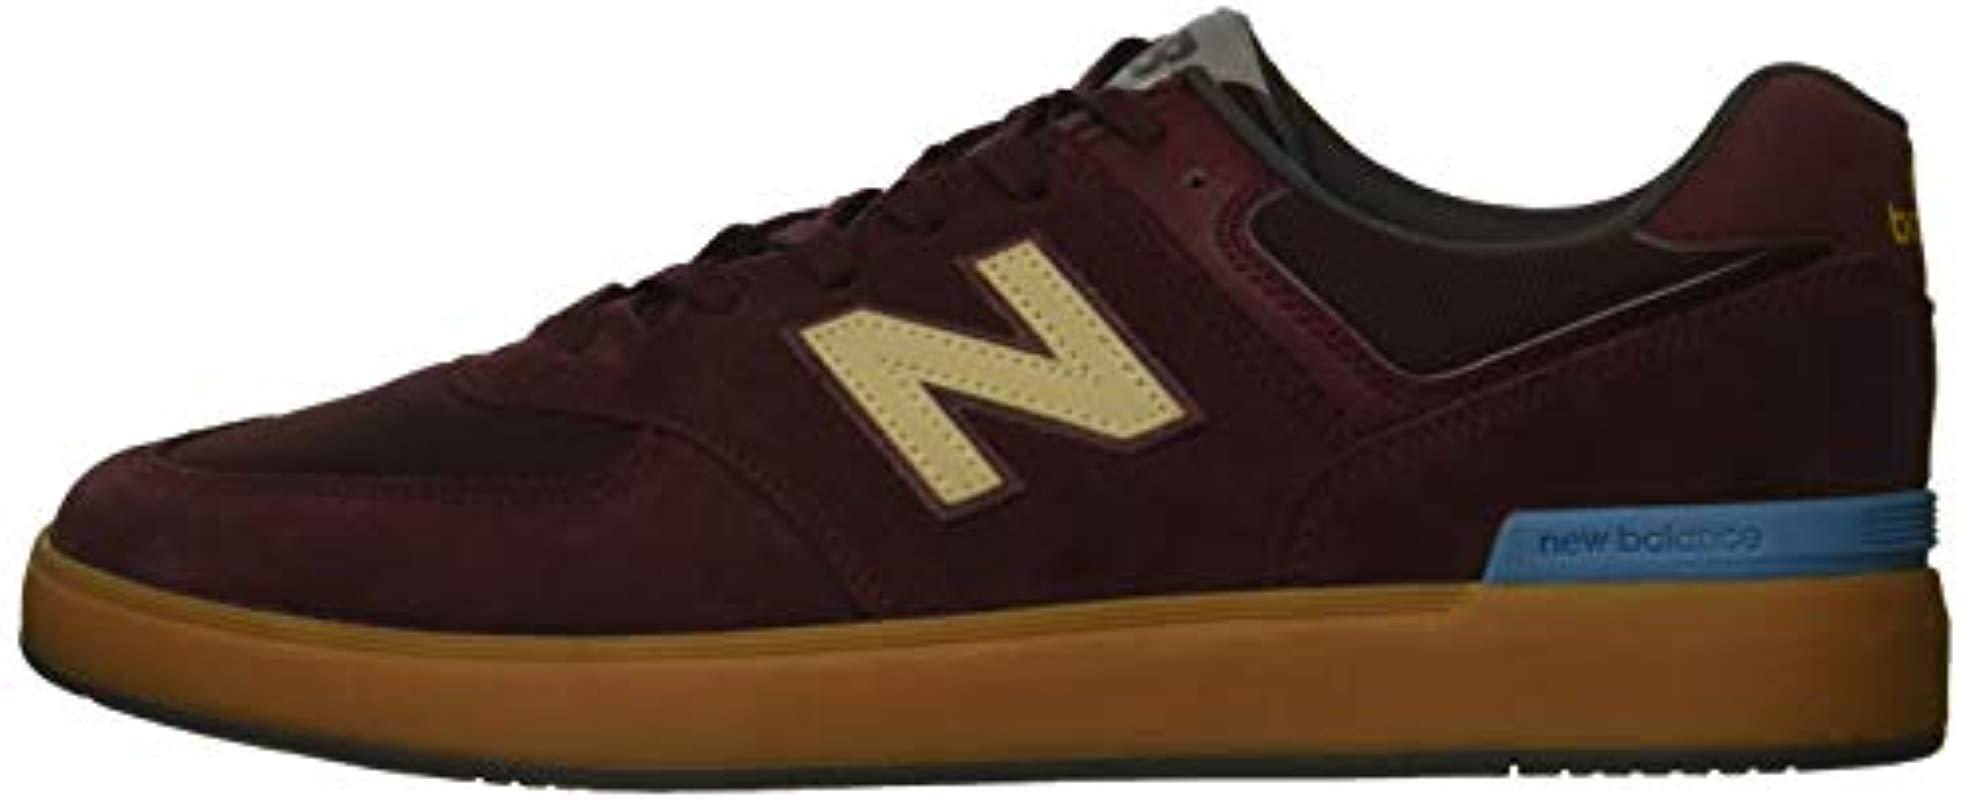 New Balance Leather All Coasts 574 V1